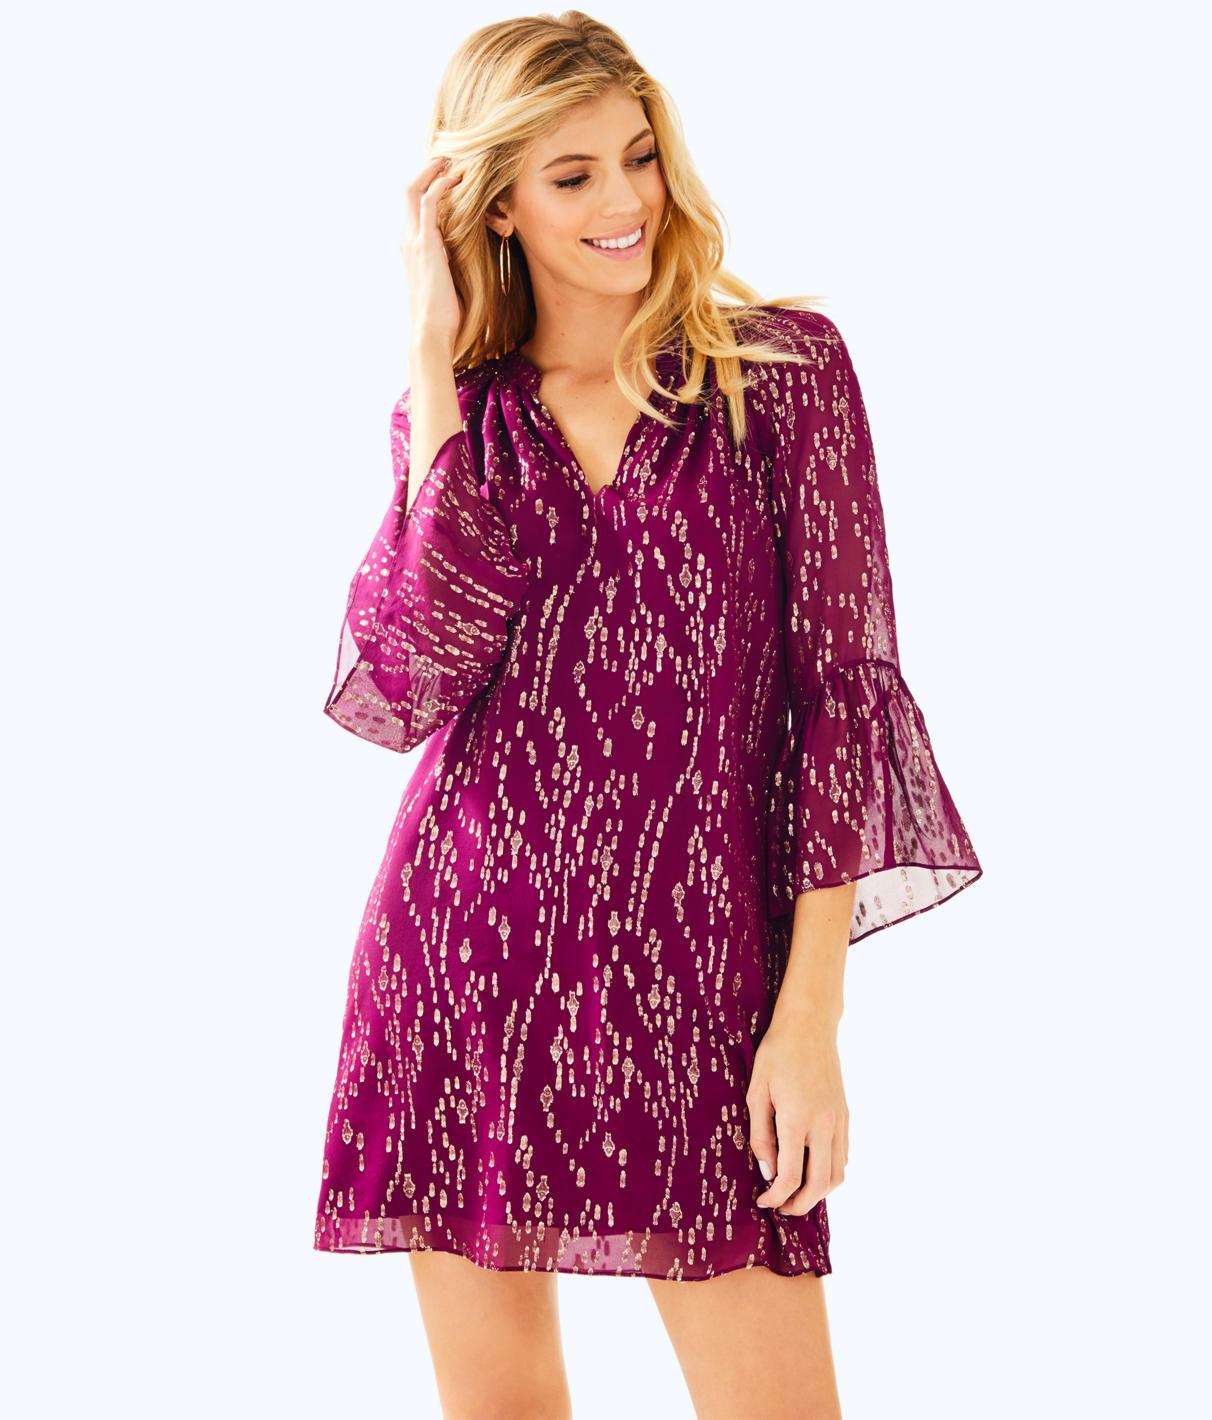 Lilly Pulitzer Matilda Silk Tunic Dress